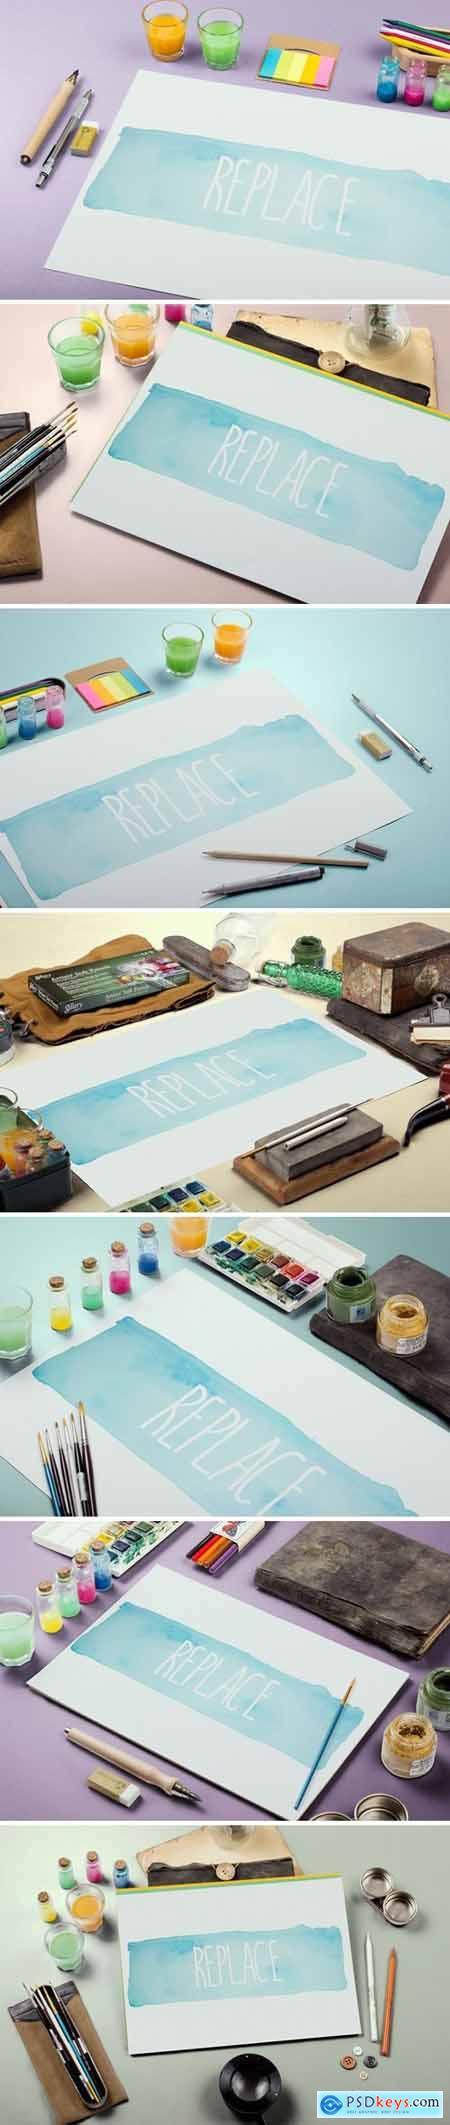 Watercolor Paint Mockup Template Bundle